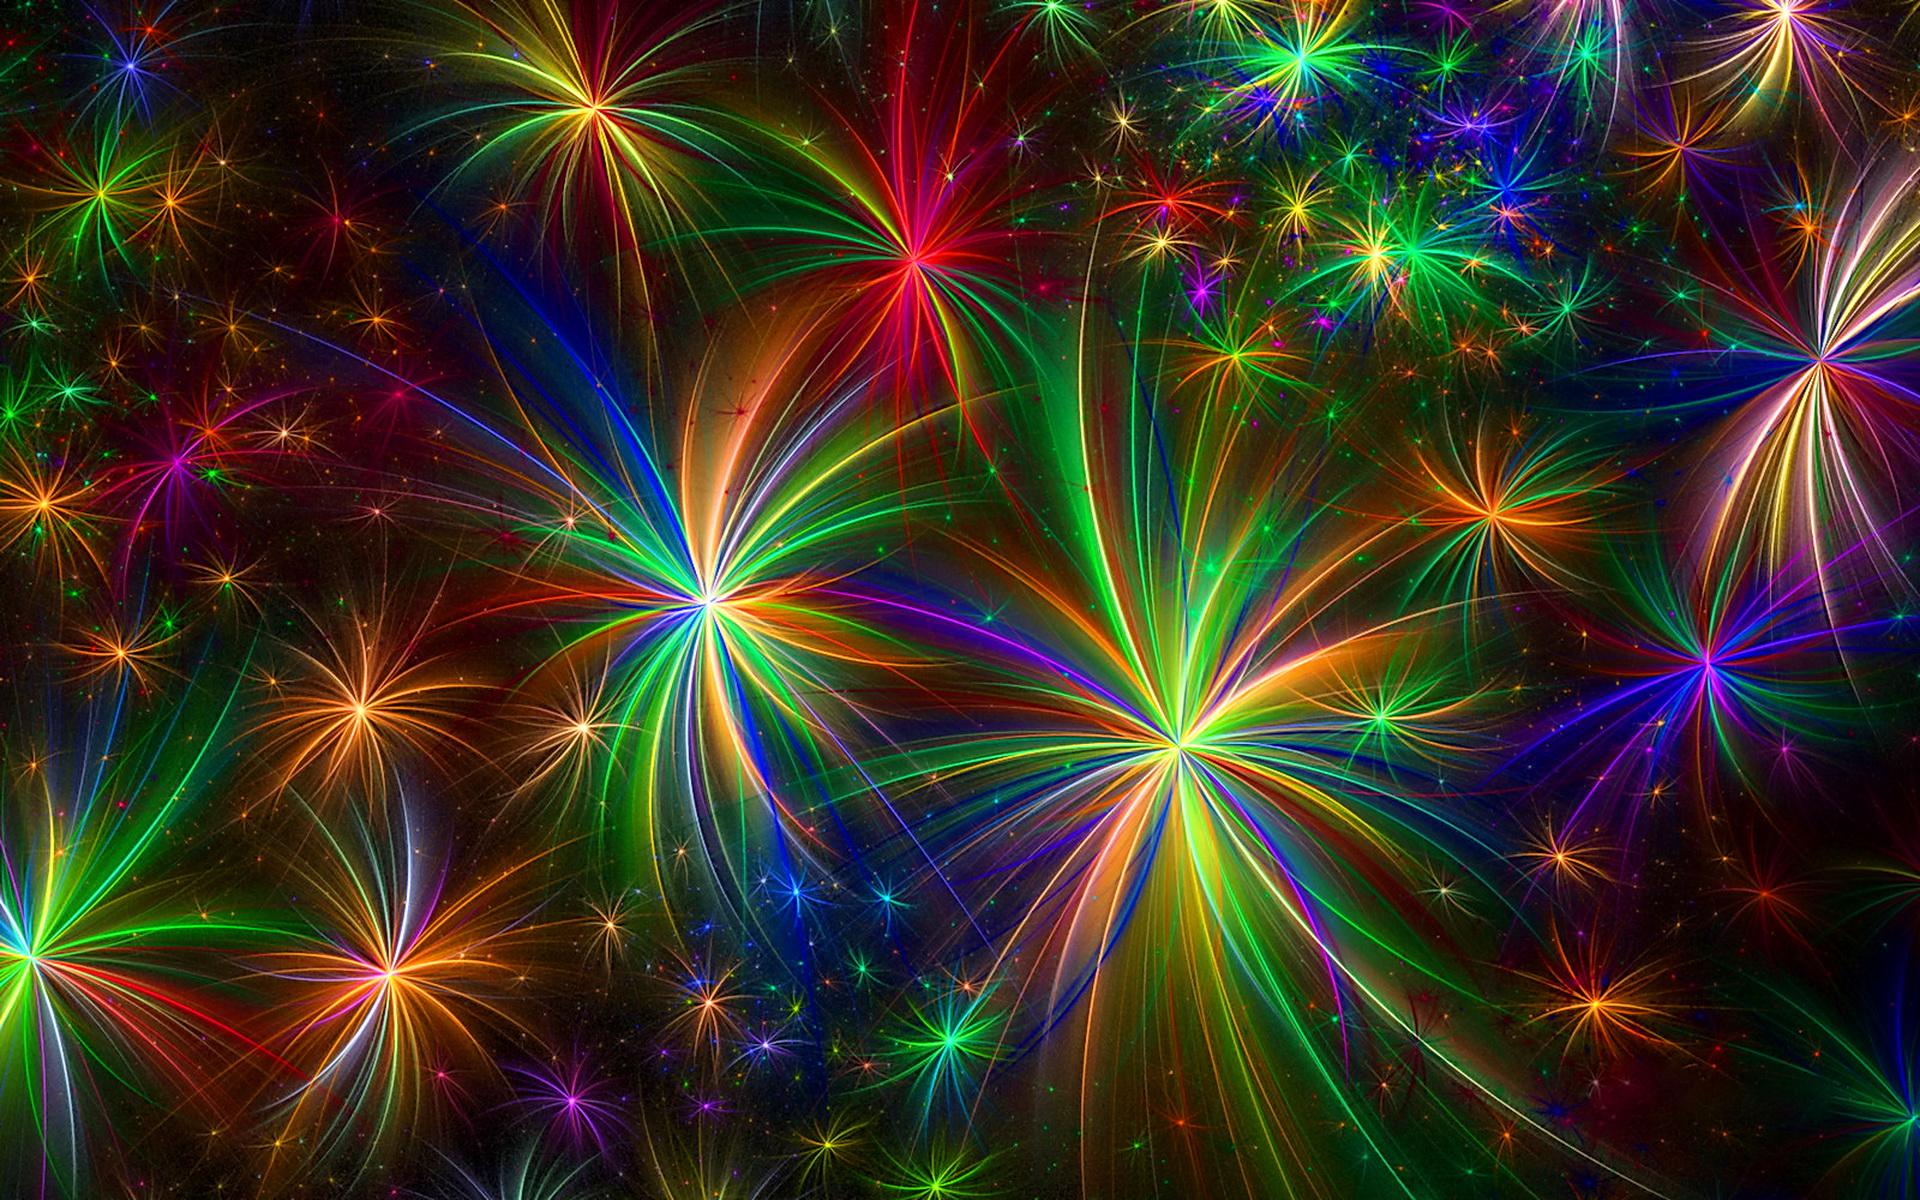 Fireworks Wallpaper Image Pics 2014 1920x1200